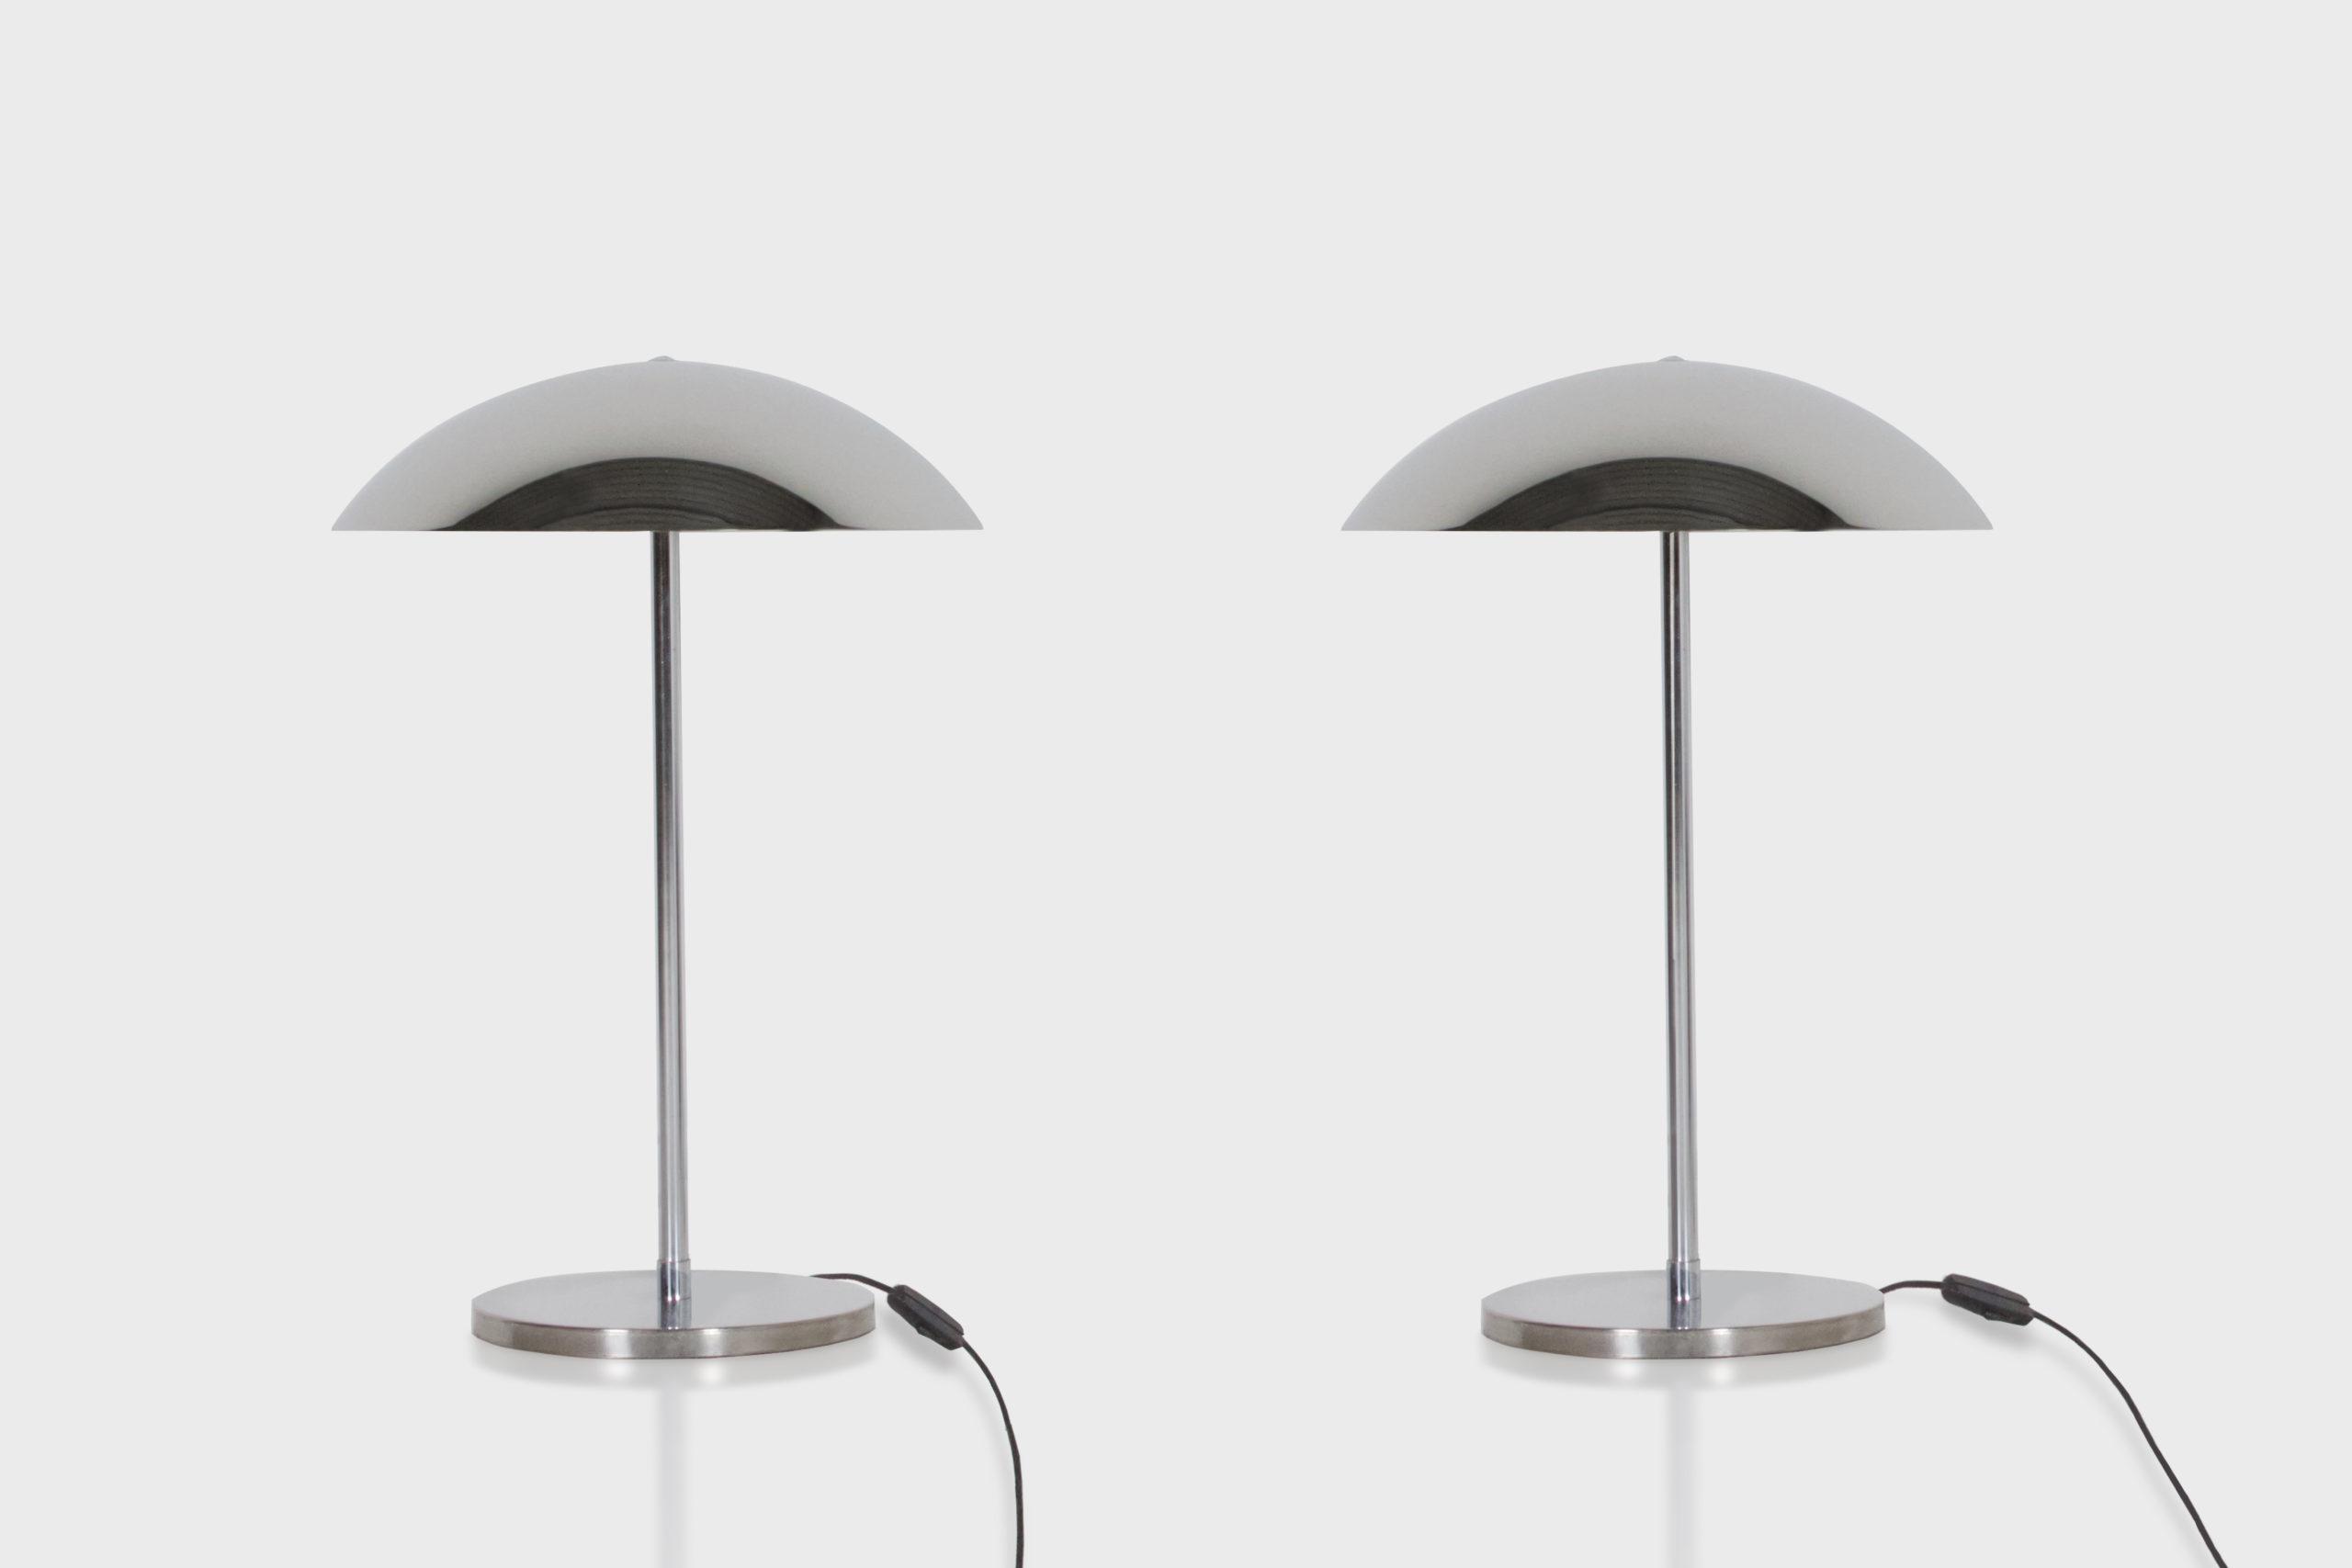 Pair of Elegant Bauhaus Table Lamps by Lumess Studio Cadmium